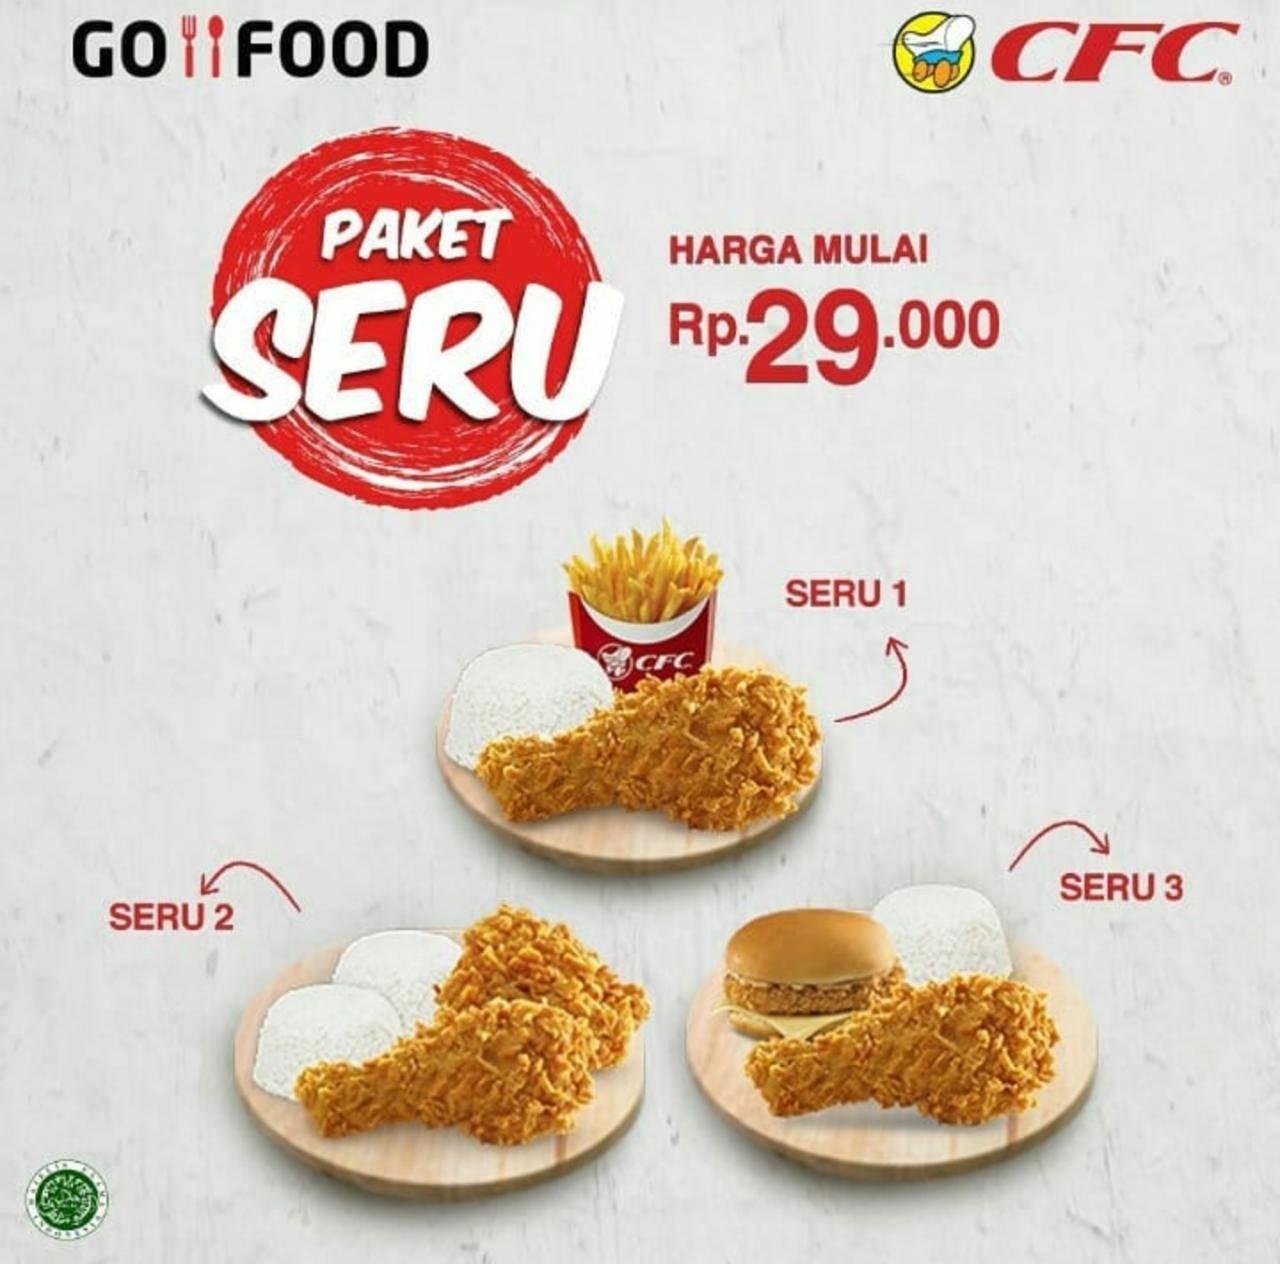 CFC Promo Paket Seru, Harga Mulai Dari Rp. 29.000